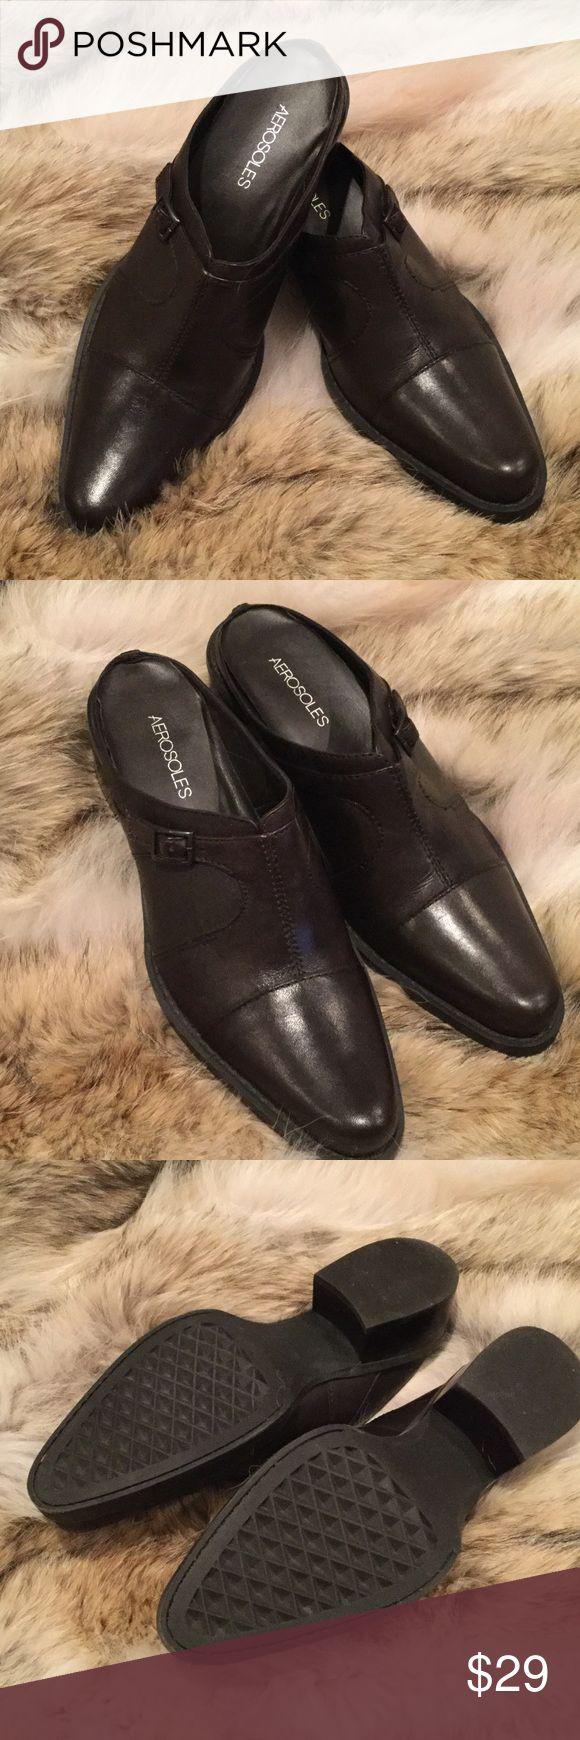 "Ladies mule clog brown leather Aerosols 9.5 Ladies brown leather mule clog 1 "" heel with the signature aerosols rubber comfort sole . Worn once size 9.5 AEROSOLES Shoes Mules & Clogs"